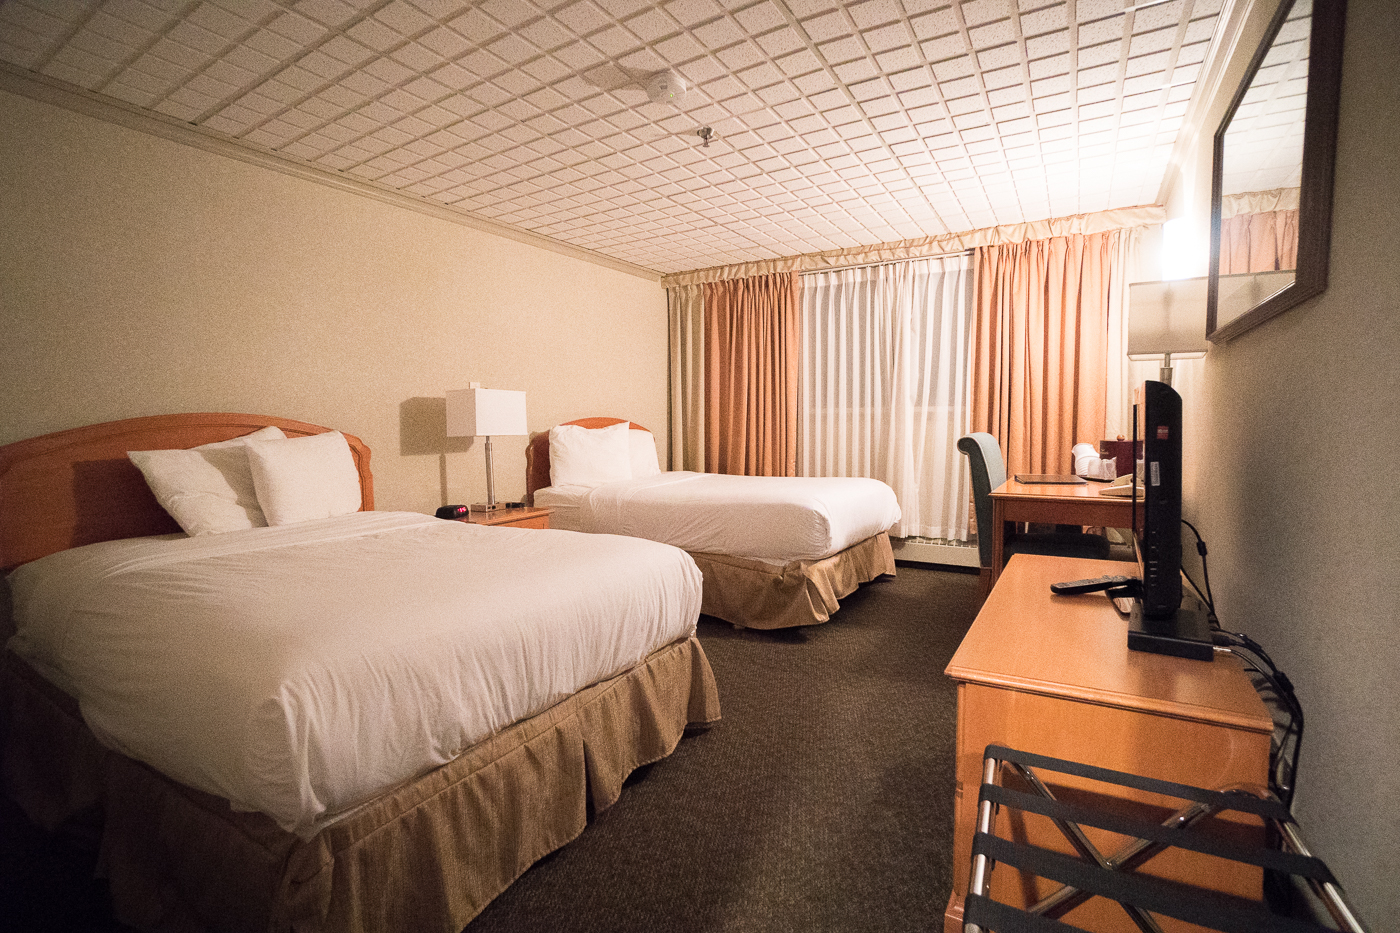 Ma chambre Hotel Westmark - Où dormir à Whitehorse, Yukon